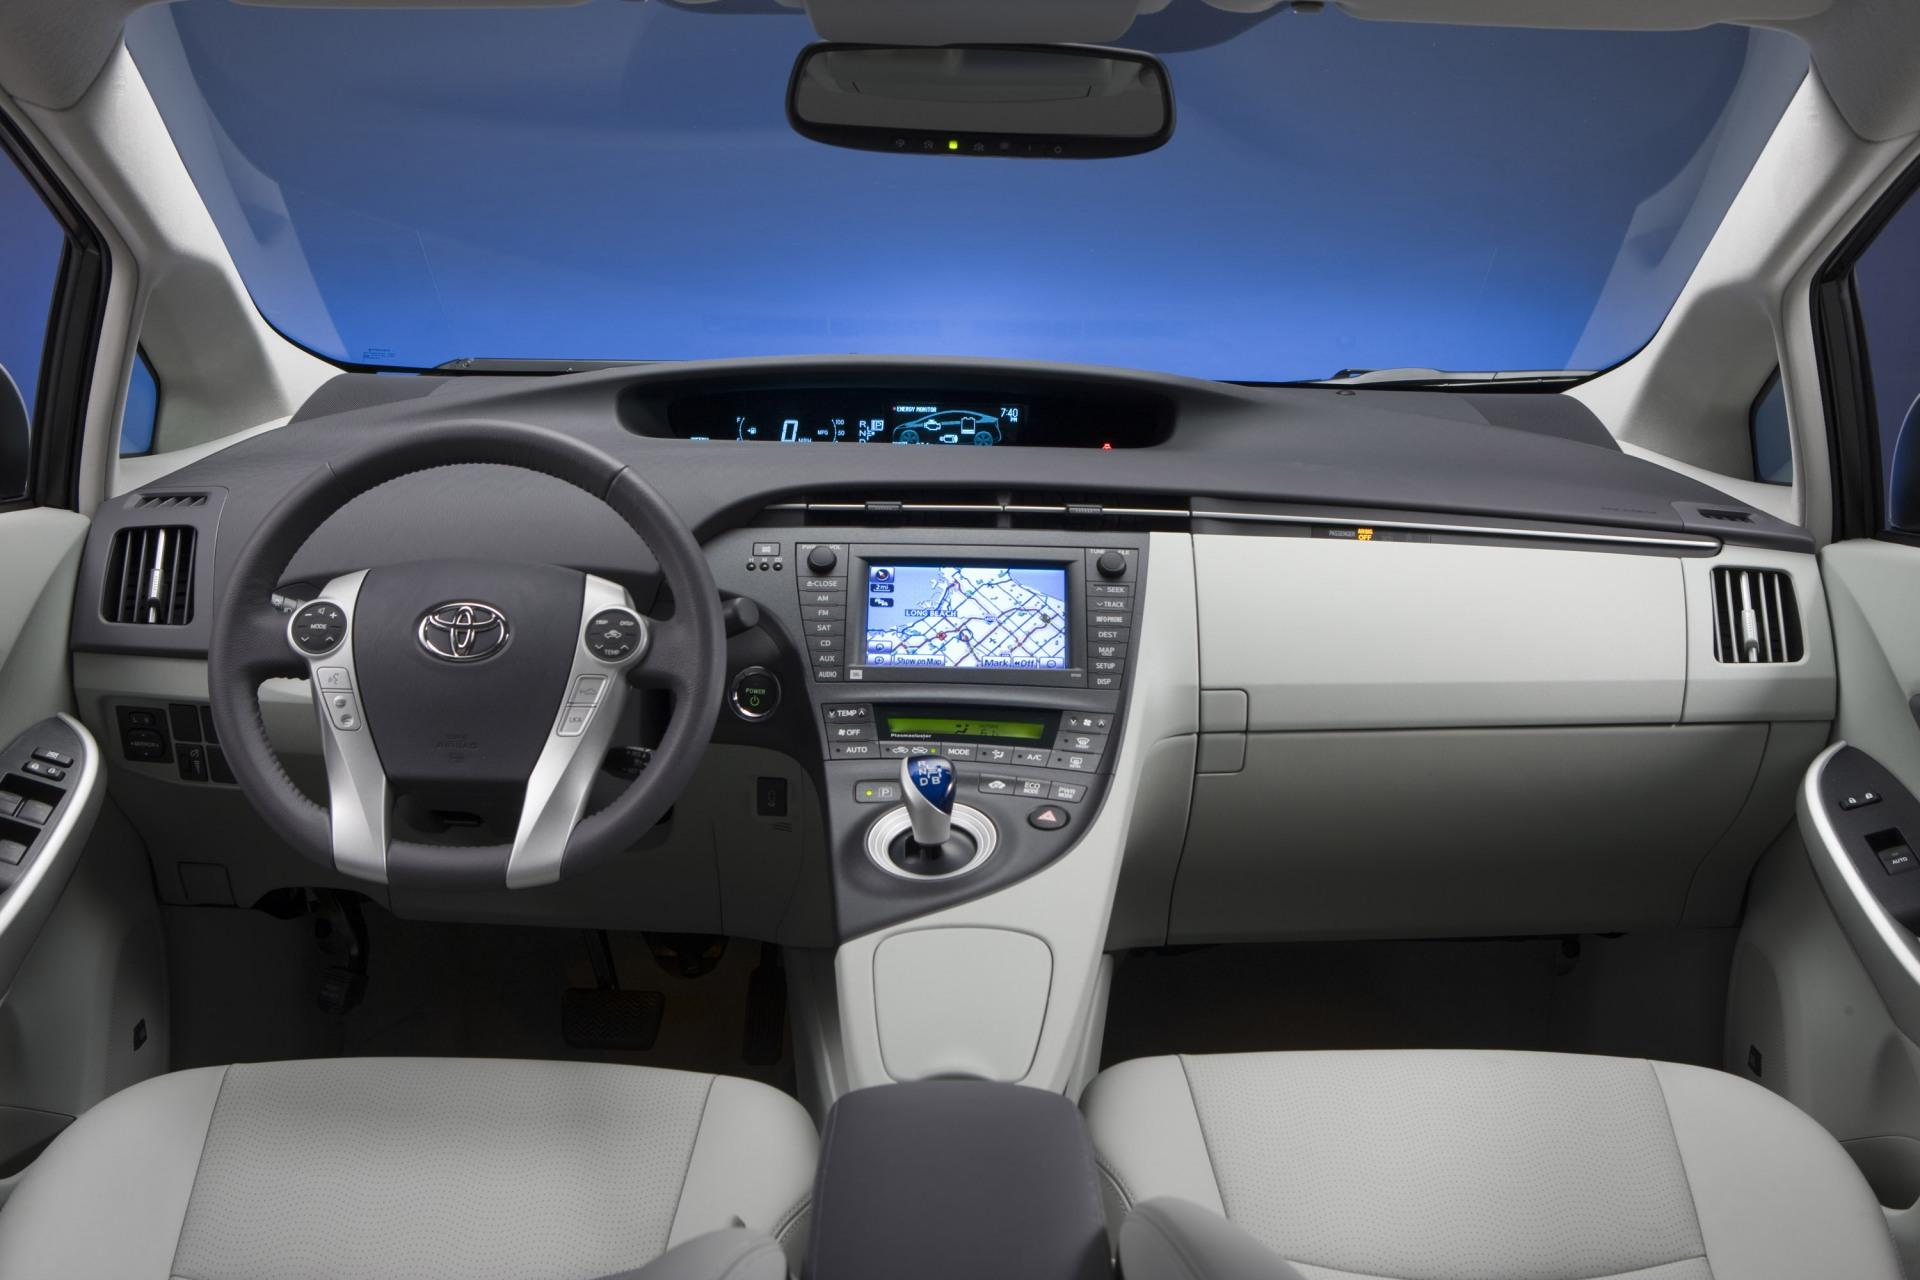 Toyota Pruis 2010average Us Hybrid Car Repair Bills Decreased In 2012 Prius Engine Fuse Diagram Hd Wallpapers Pulse